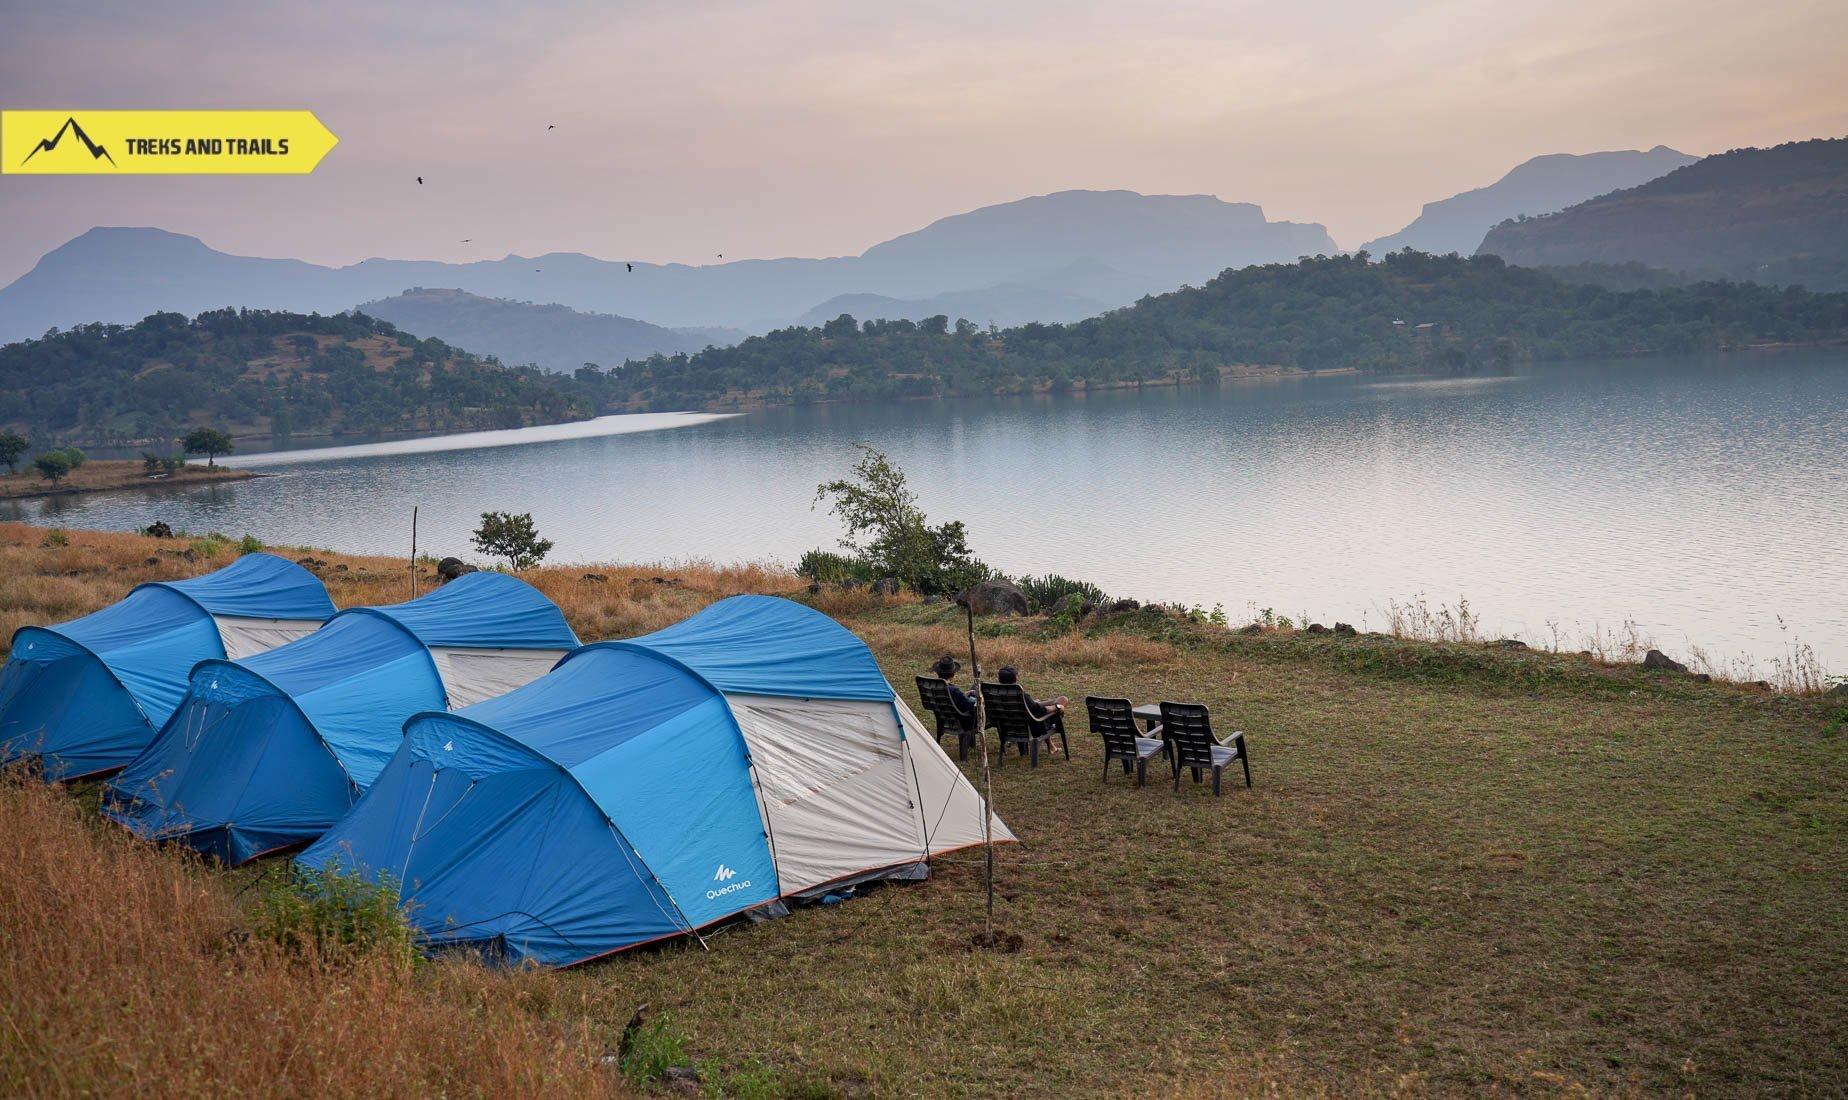 Bhandardara Camping and Sandhan Valley Trek